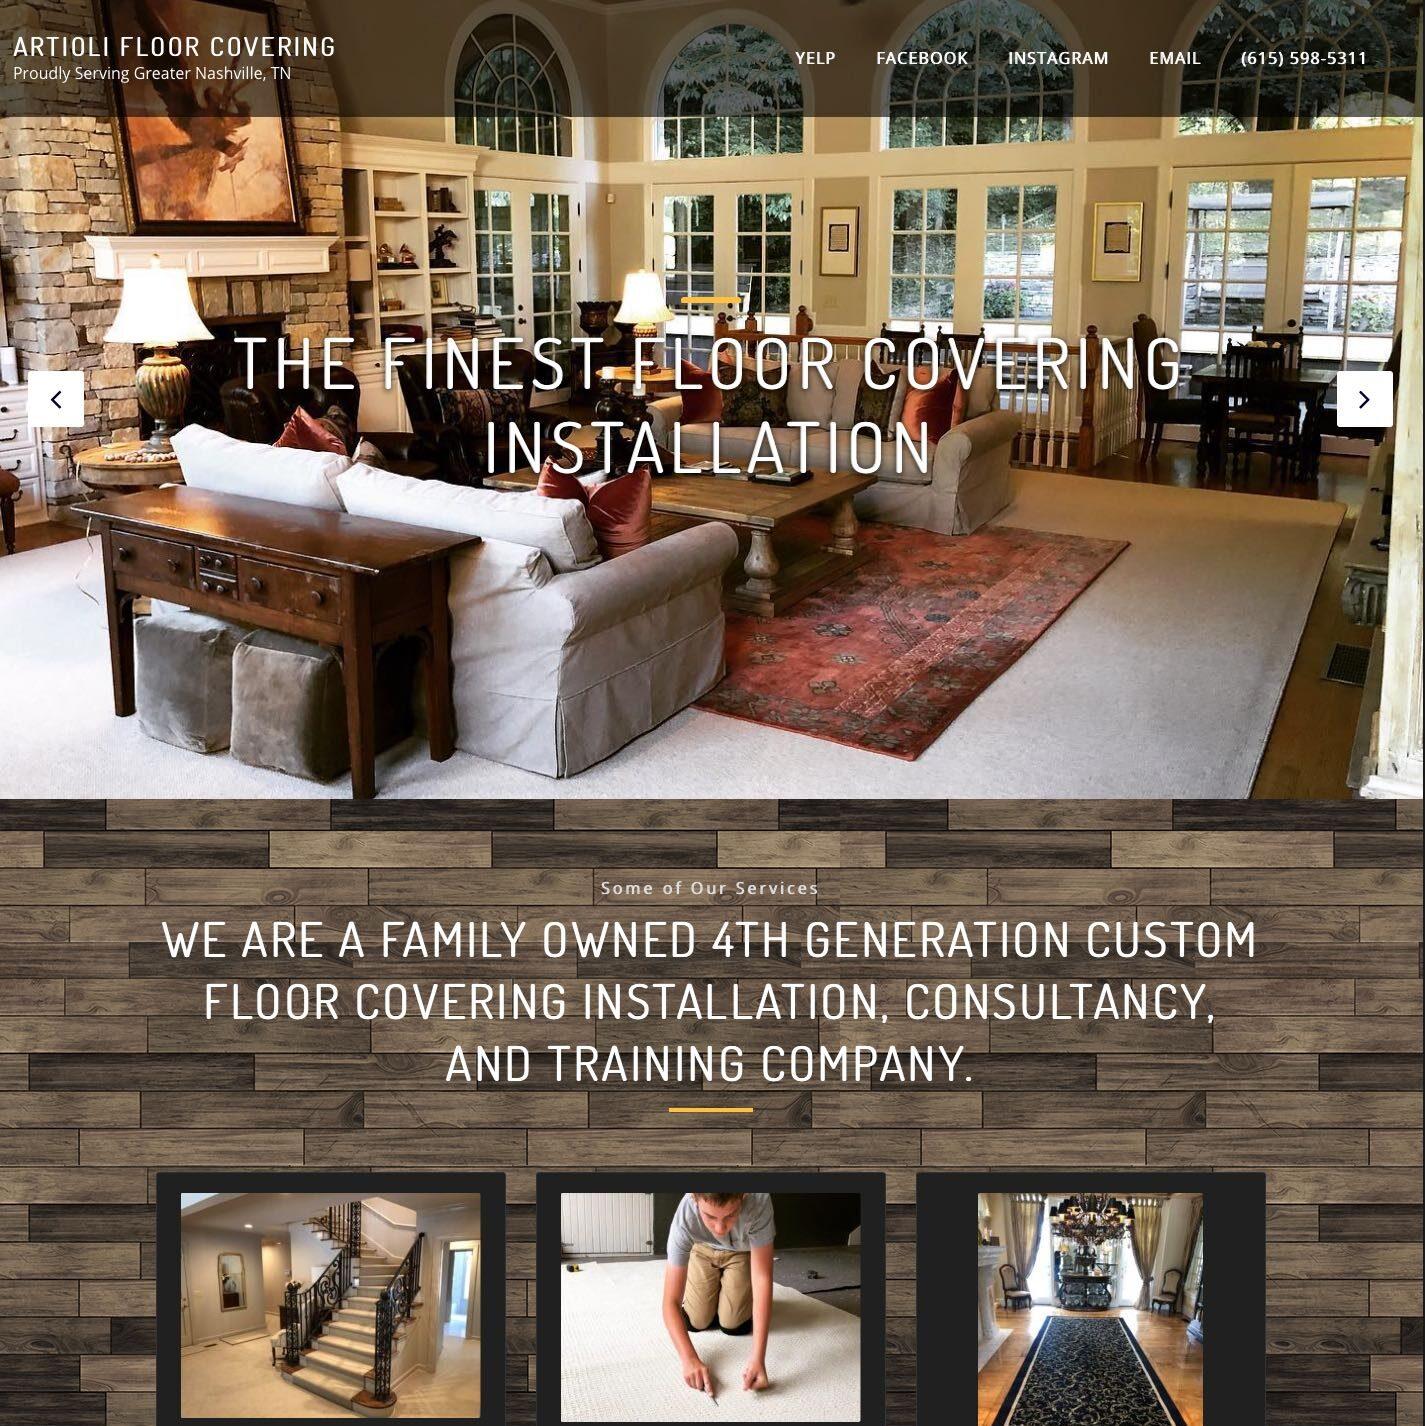 A floor installation company website